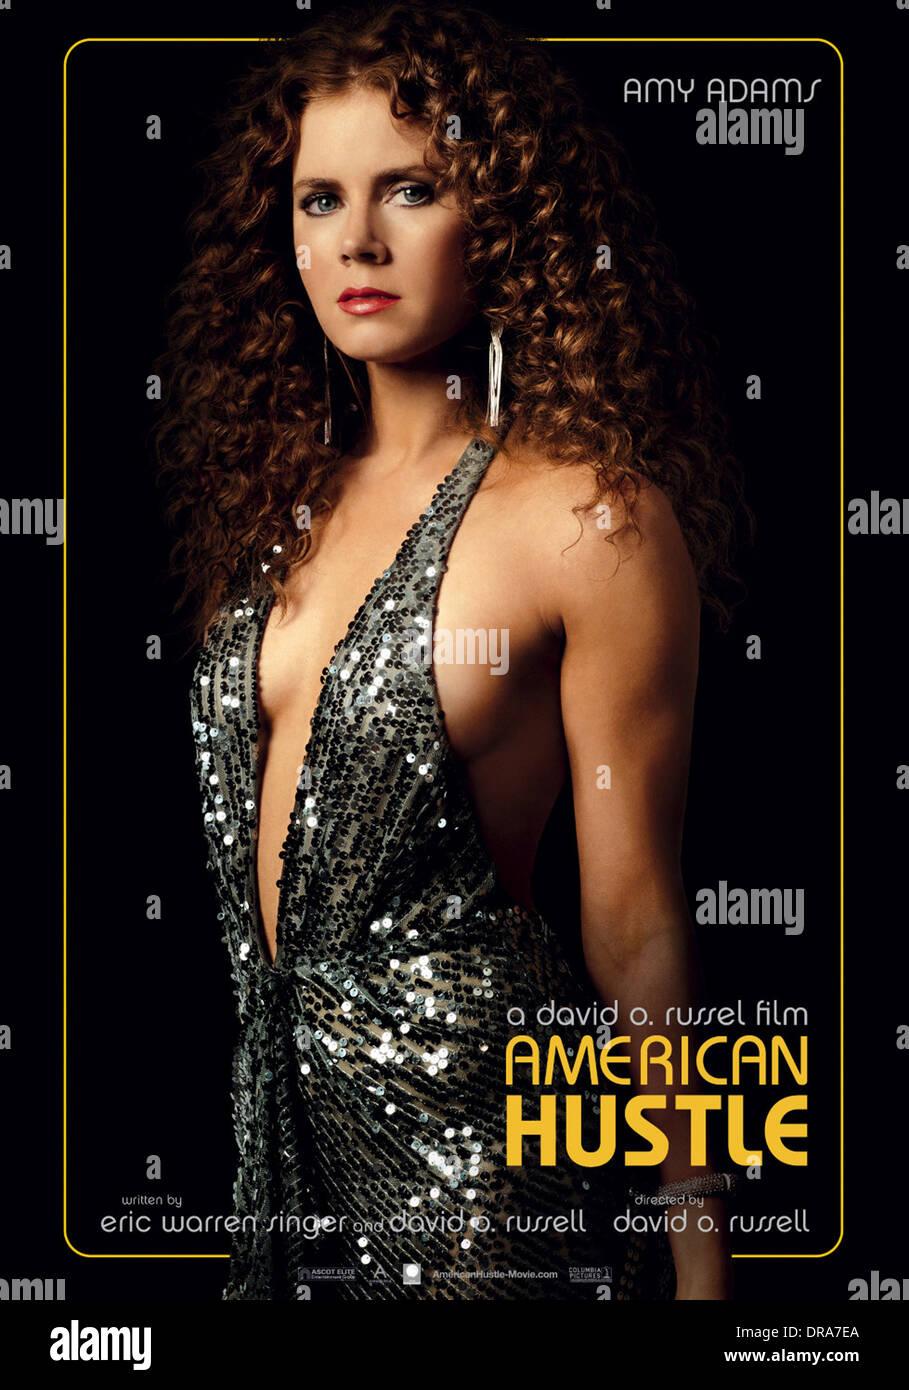 American Hustle 2013 Amy Adams David O Russell Dir Moviestore Stock Photo Alamy